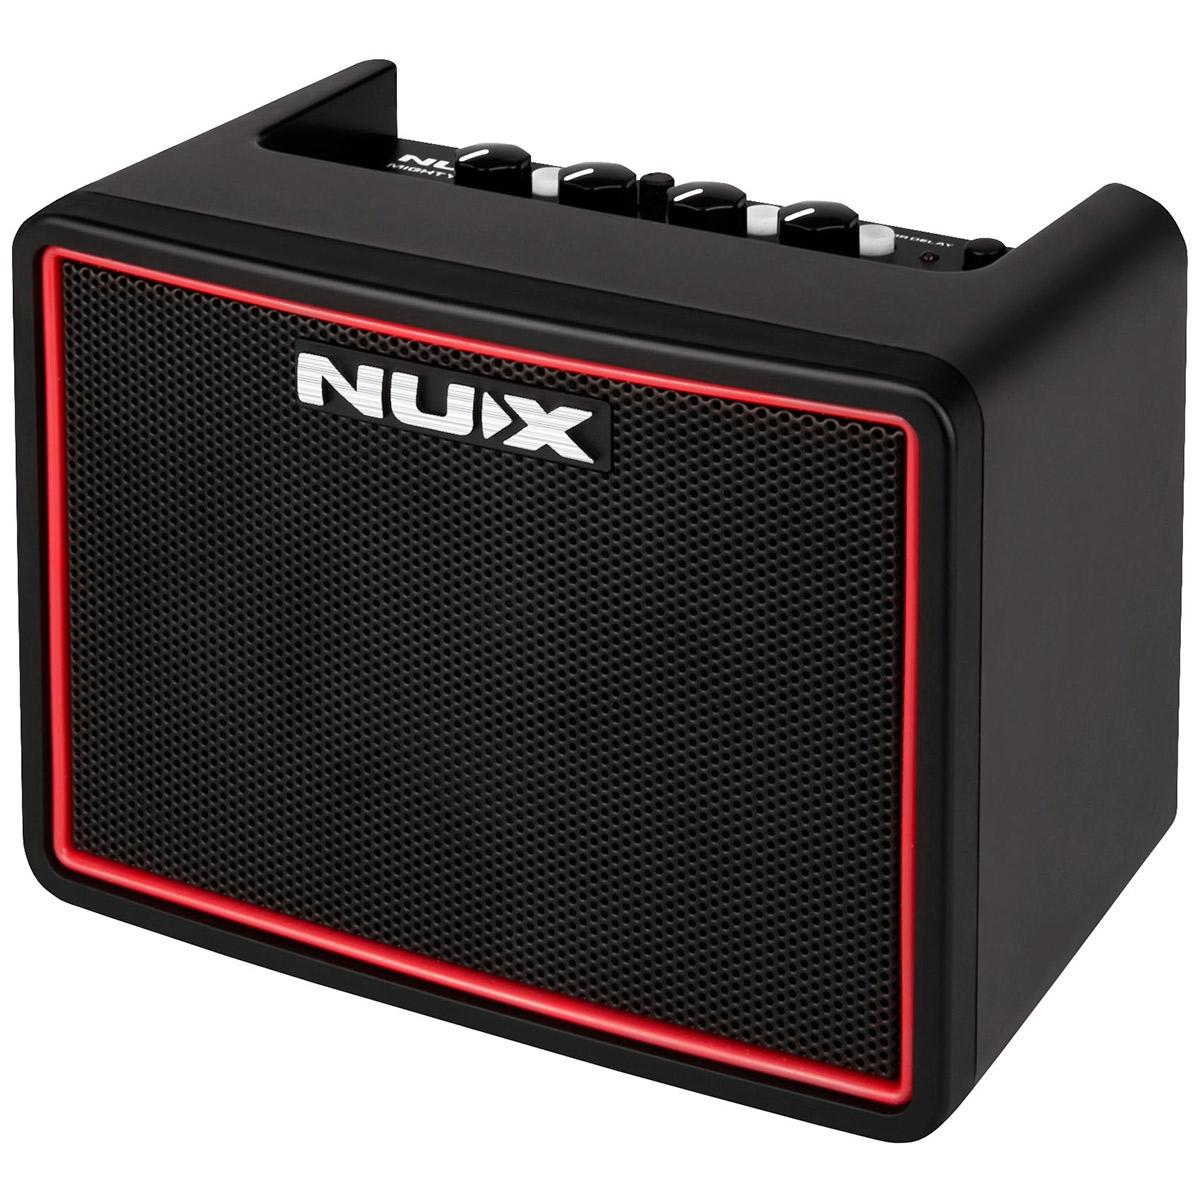 NMLBT 【ニューエックス】 NUX BT Lite ミニモデリングアンプ Mighty